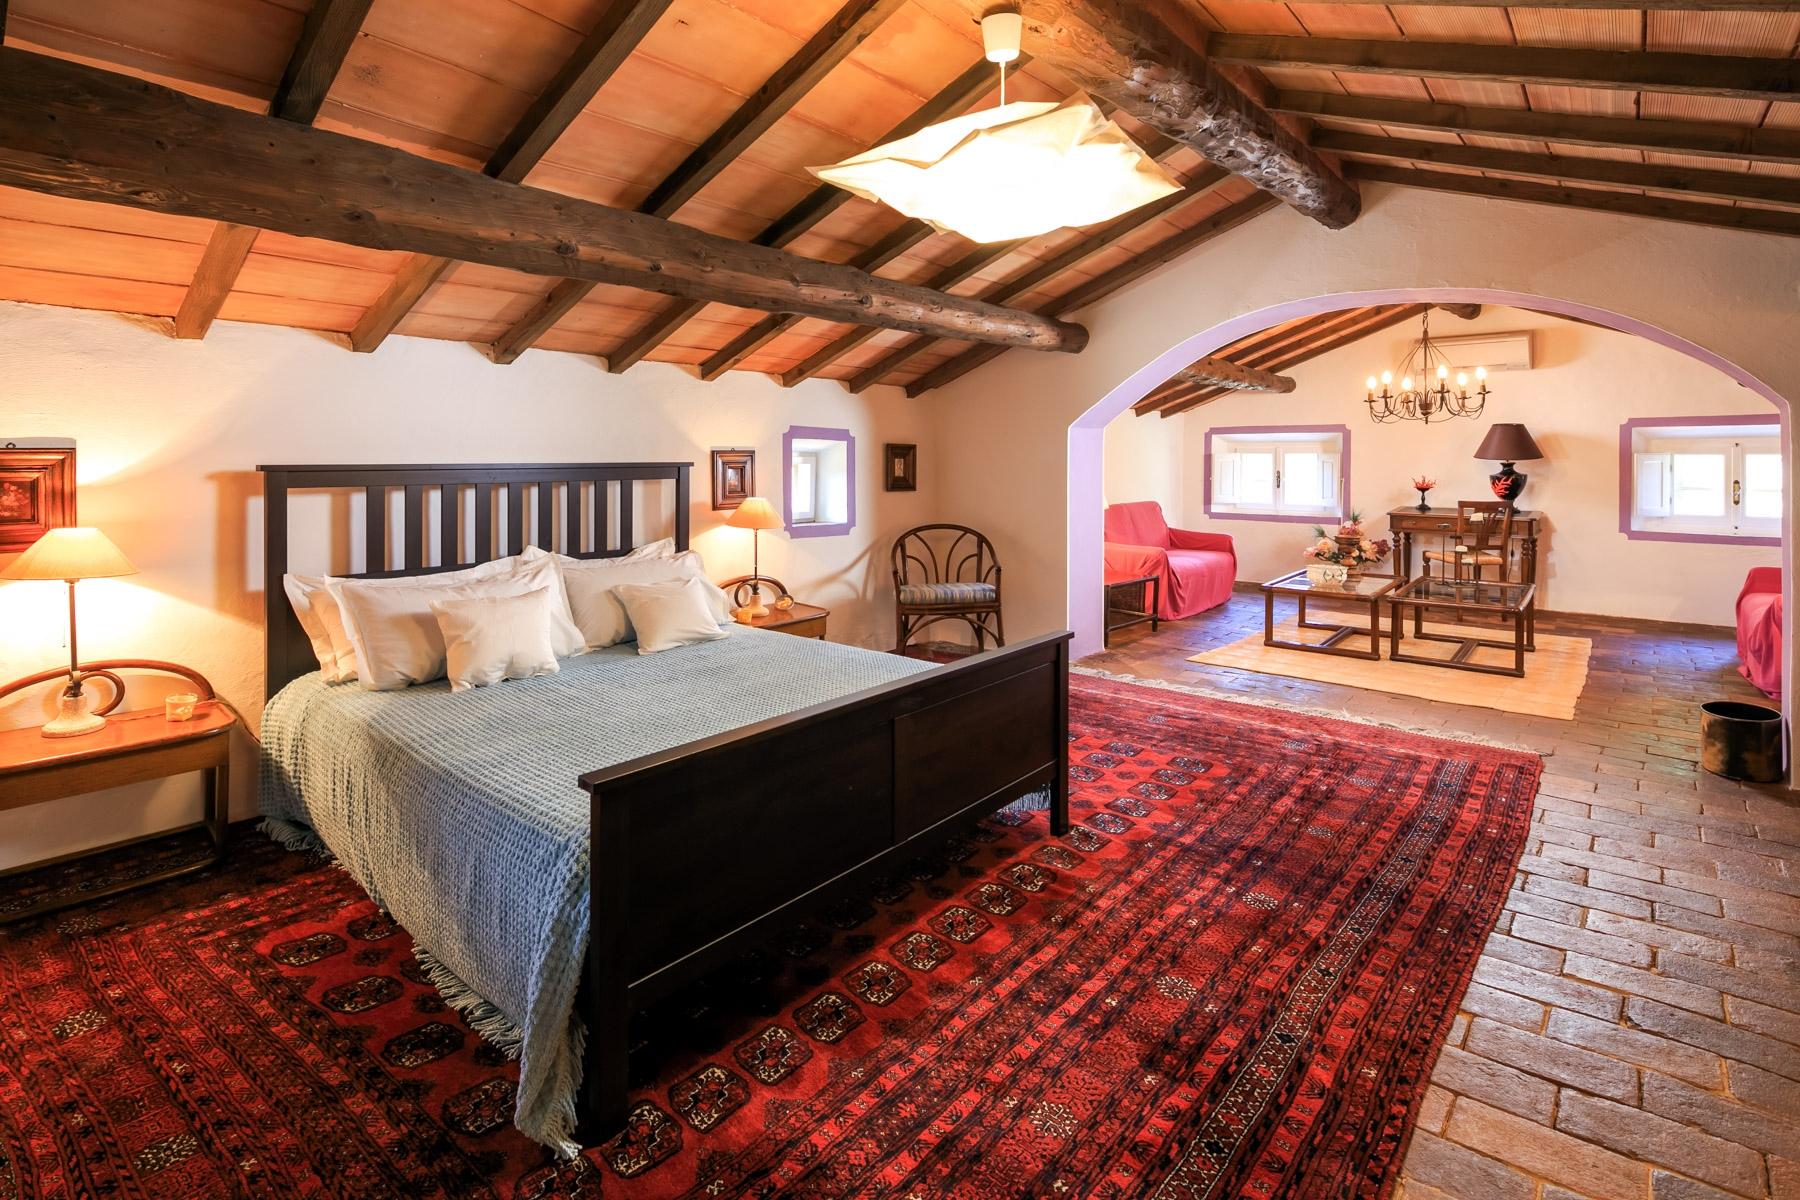 Villa in Vendita a Campiglia Marittima: 5 locali, 1100 mq - Foto 24